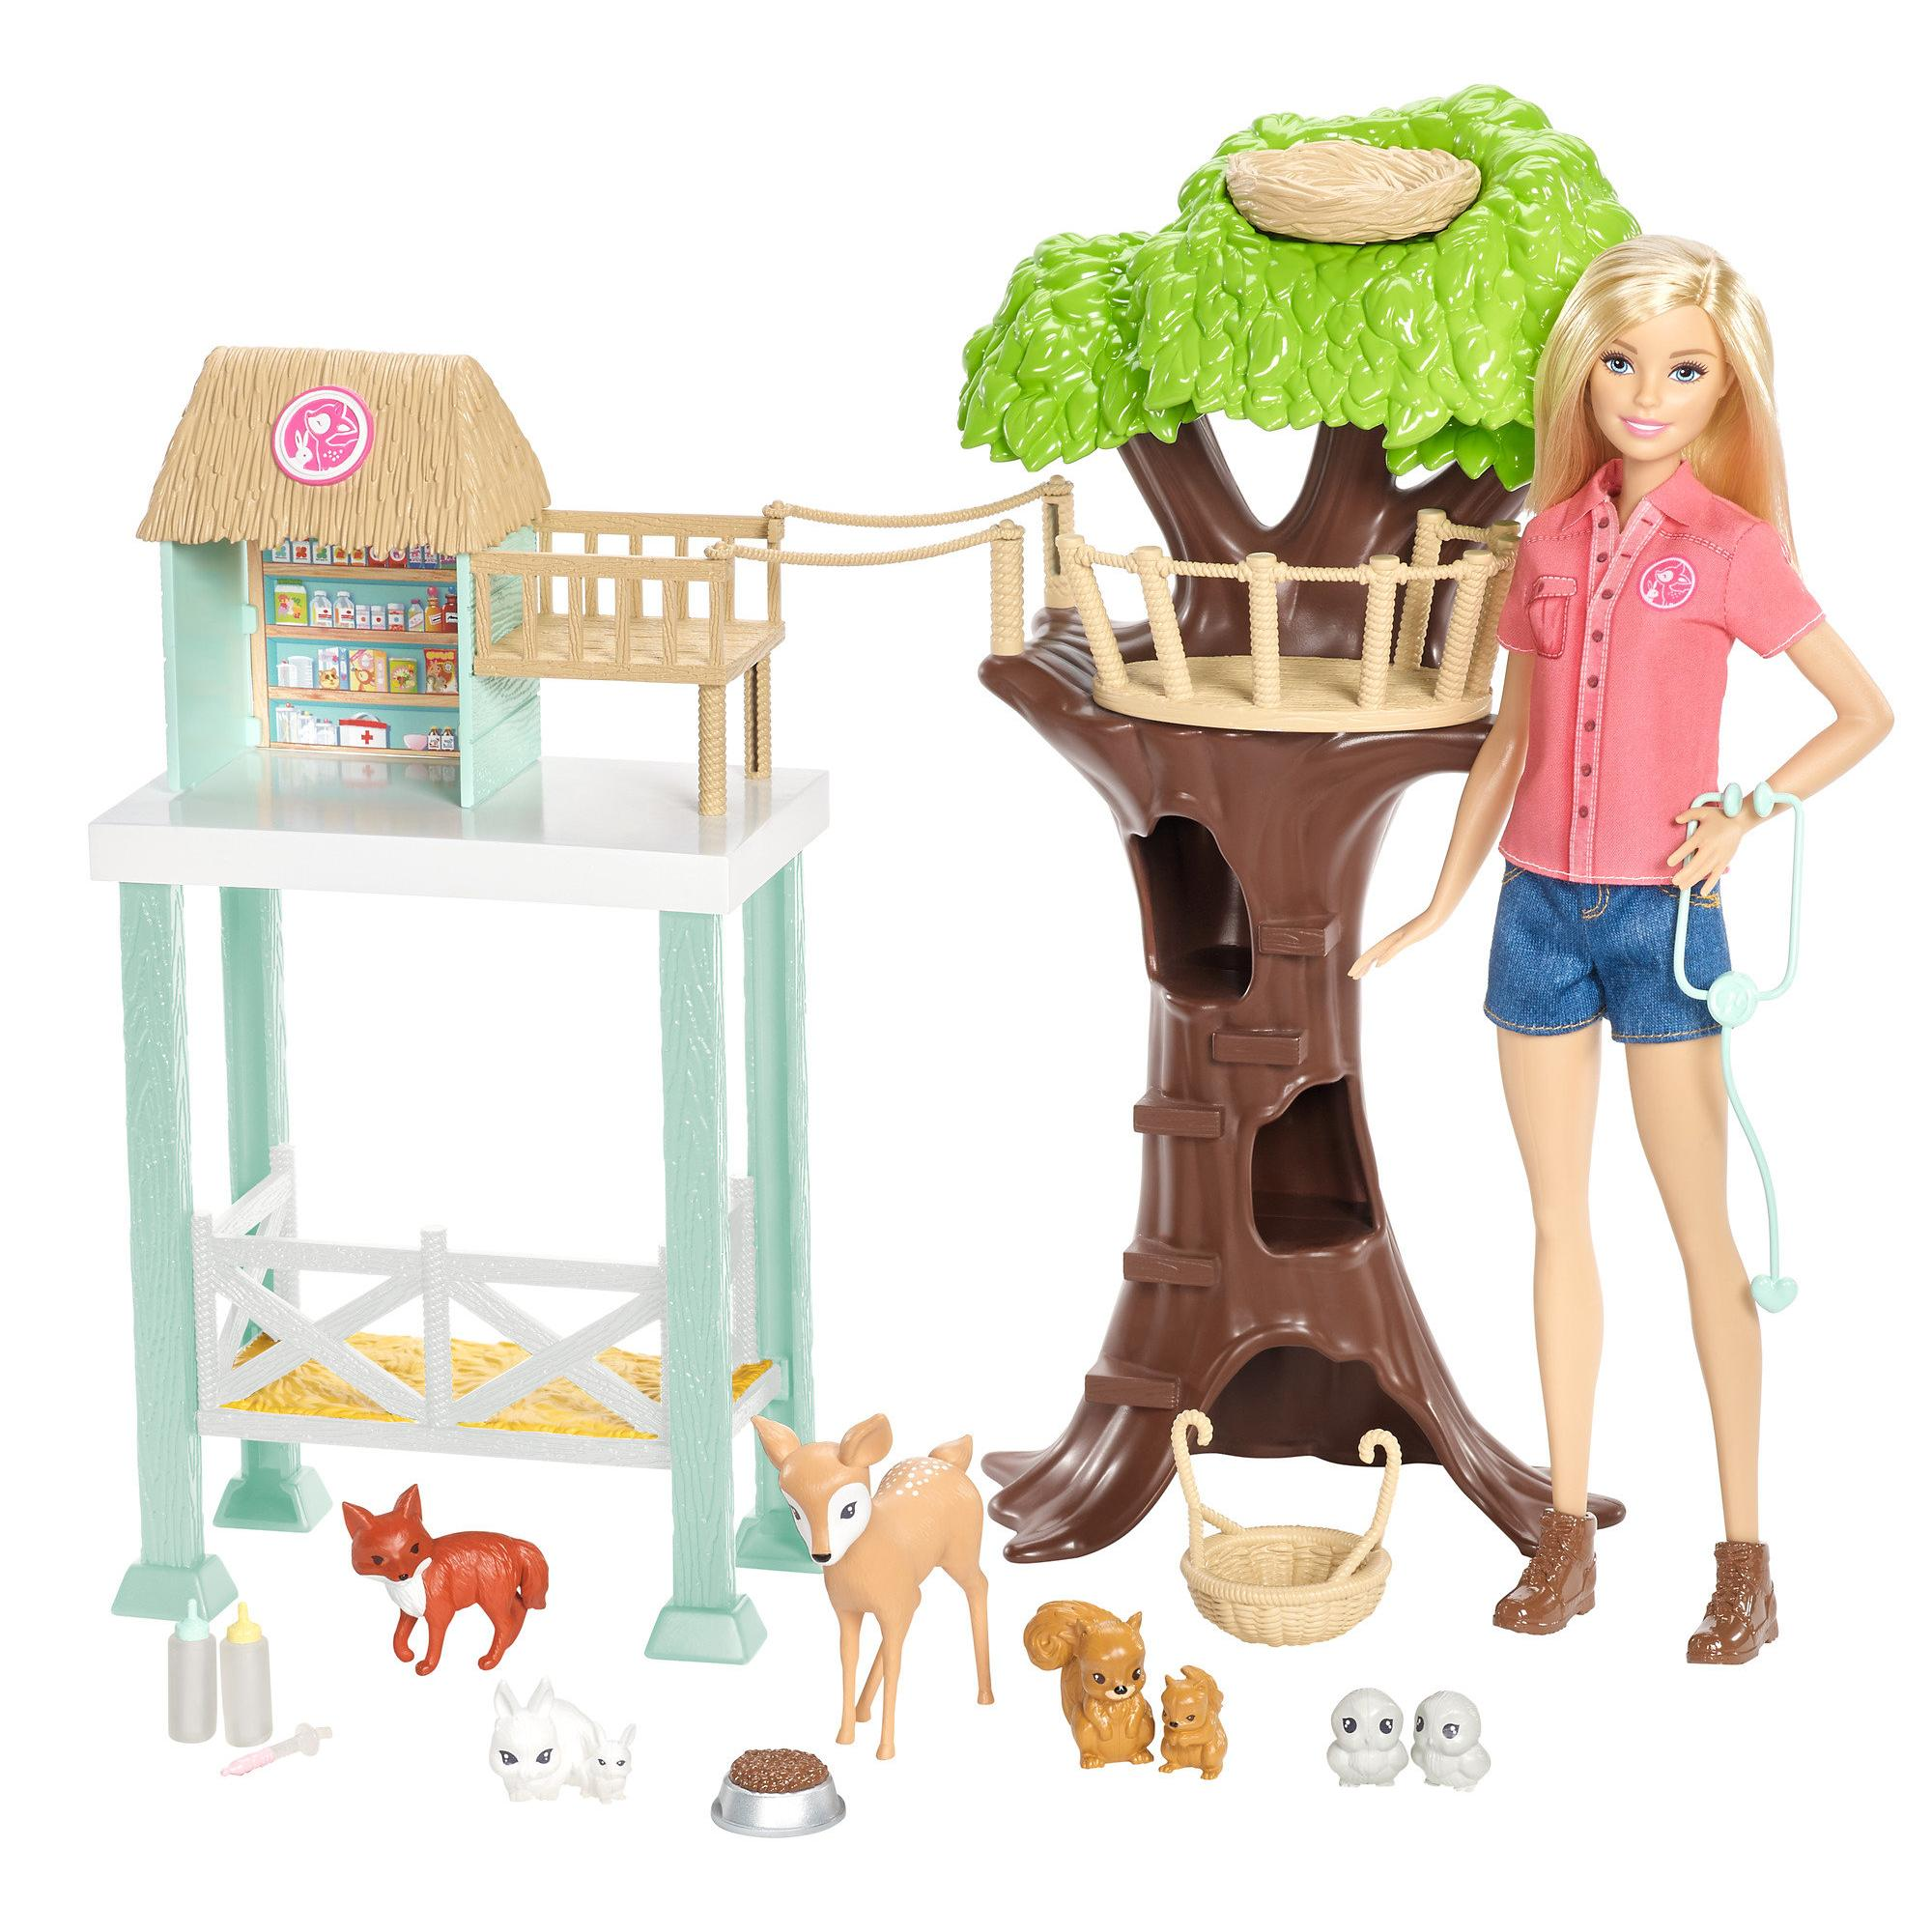 Barbie Pet Rescue Center Playset